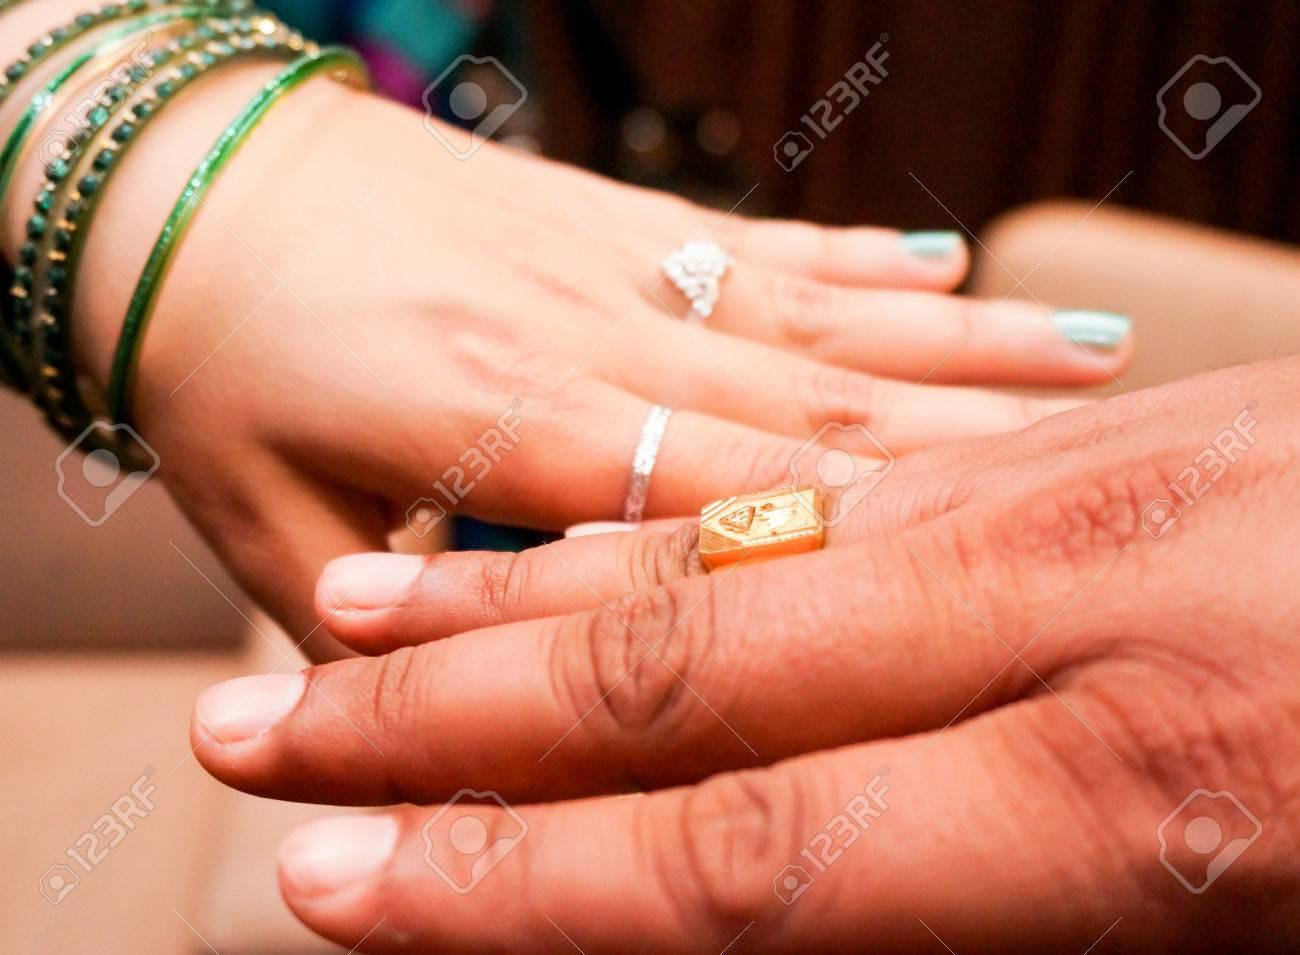 download - Indian Wedding Rings